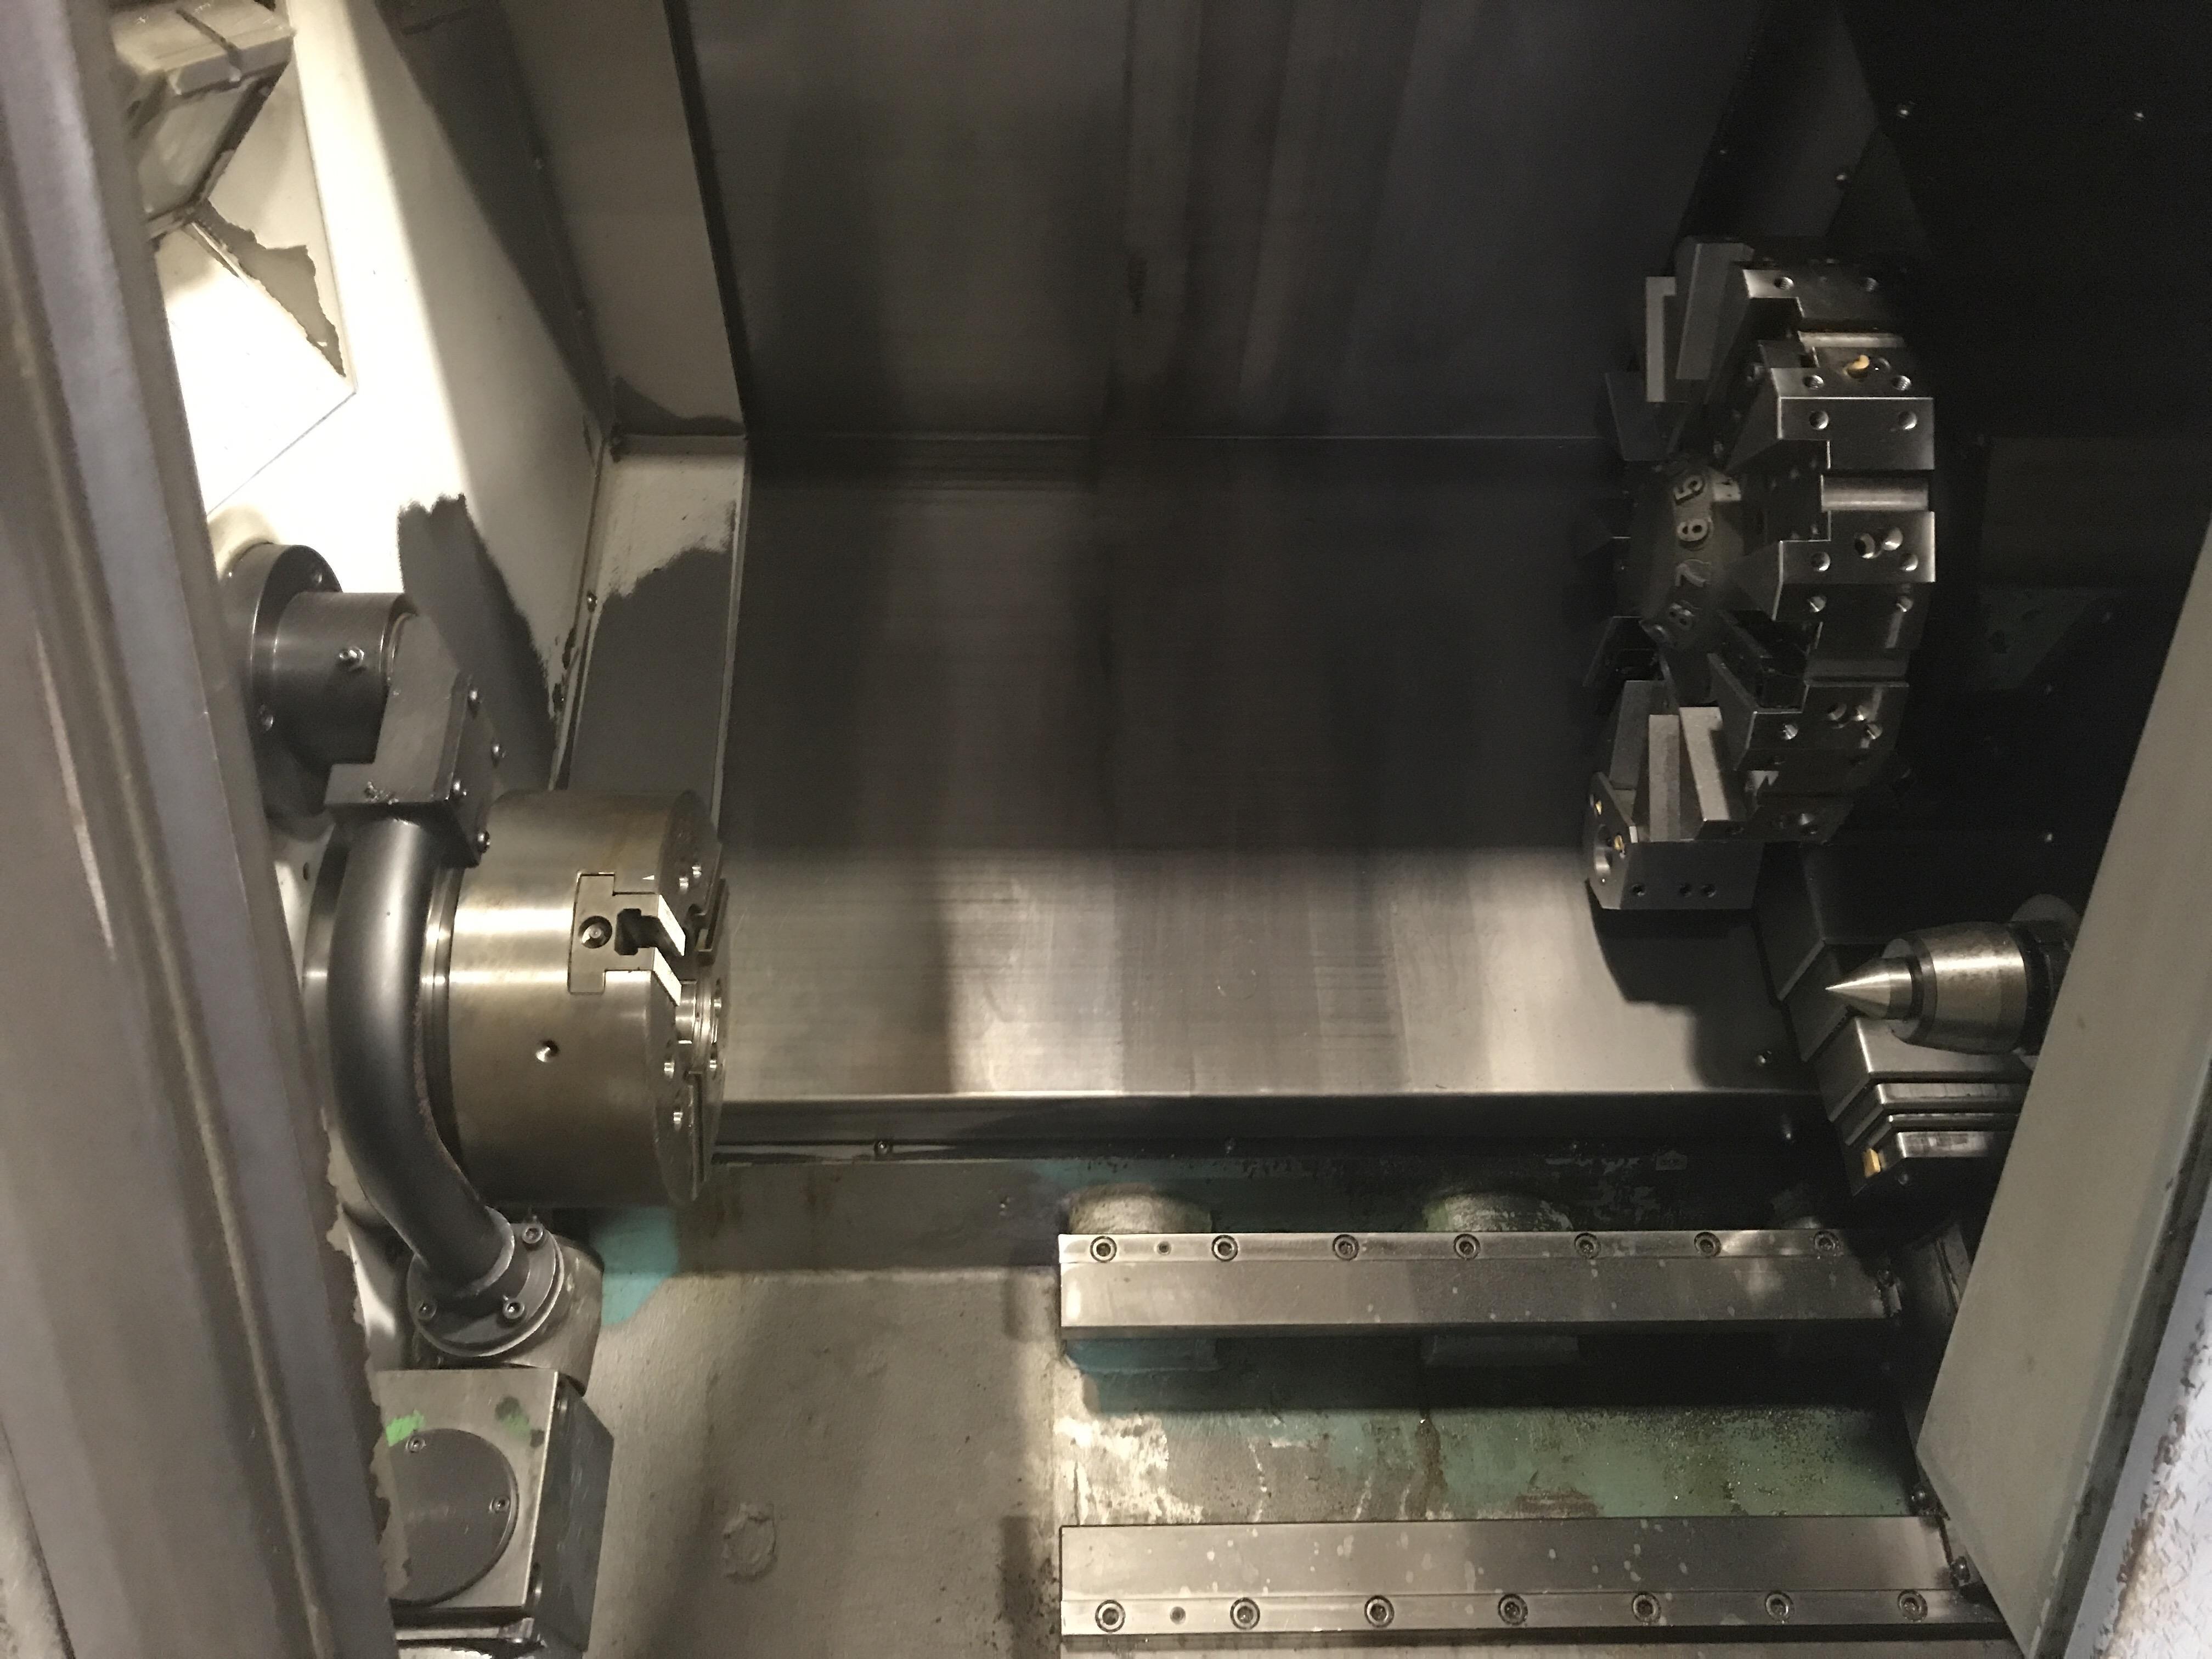 2014 DOOSAN Lynx 220LC - CNC Horizontal Lathe